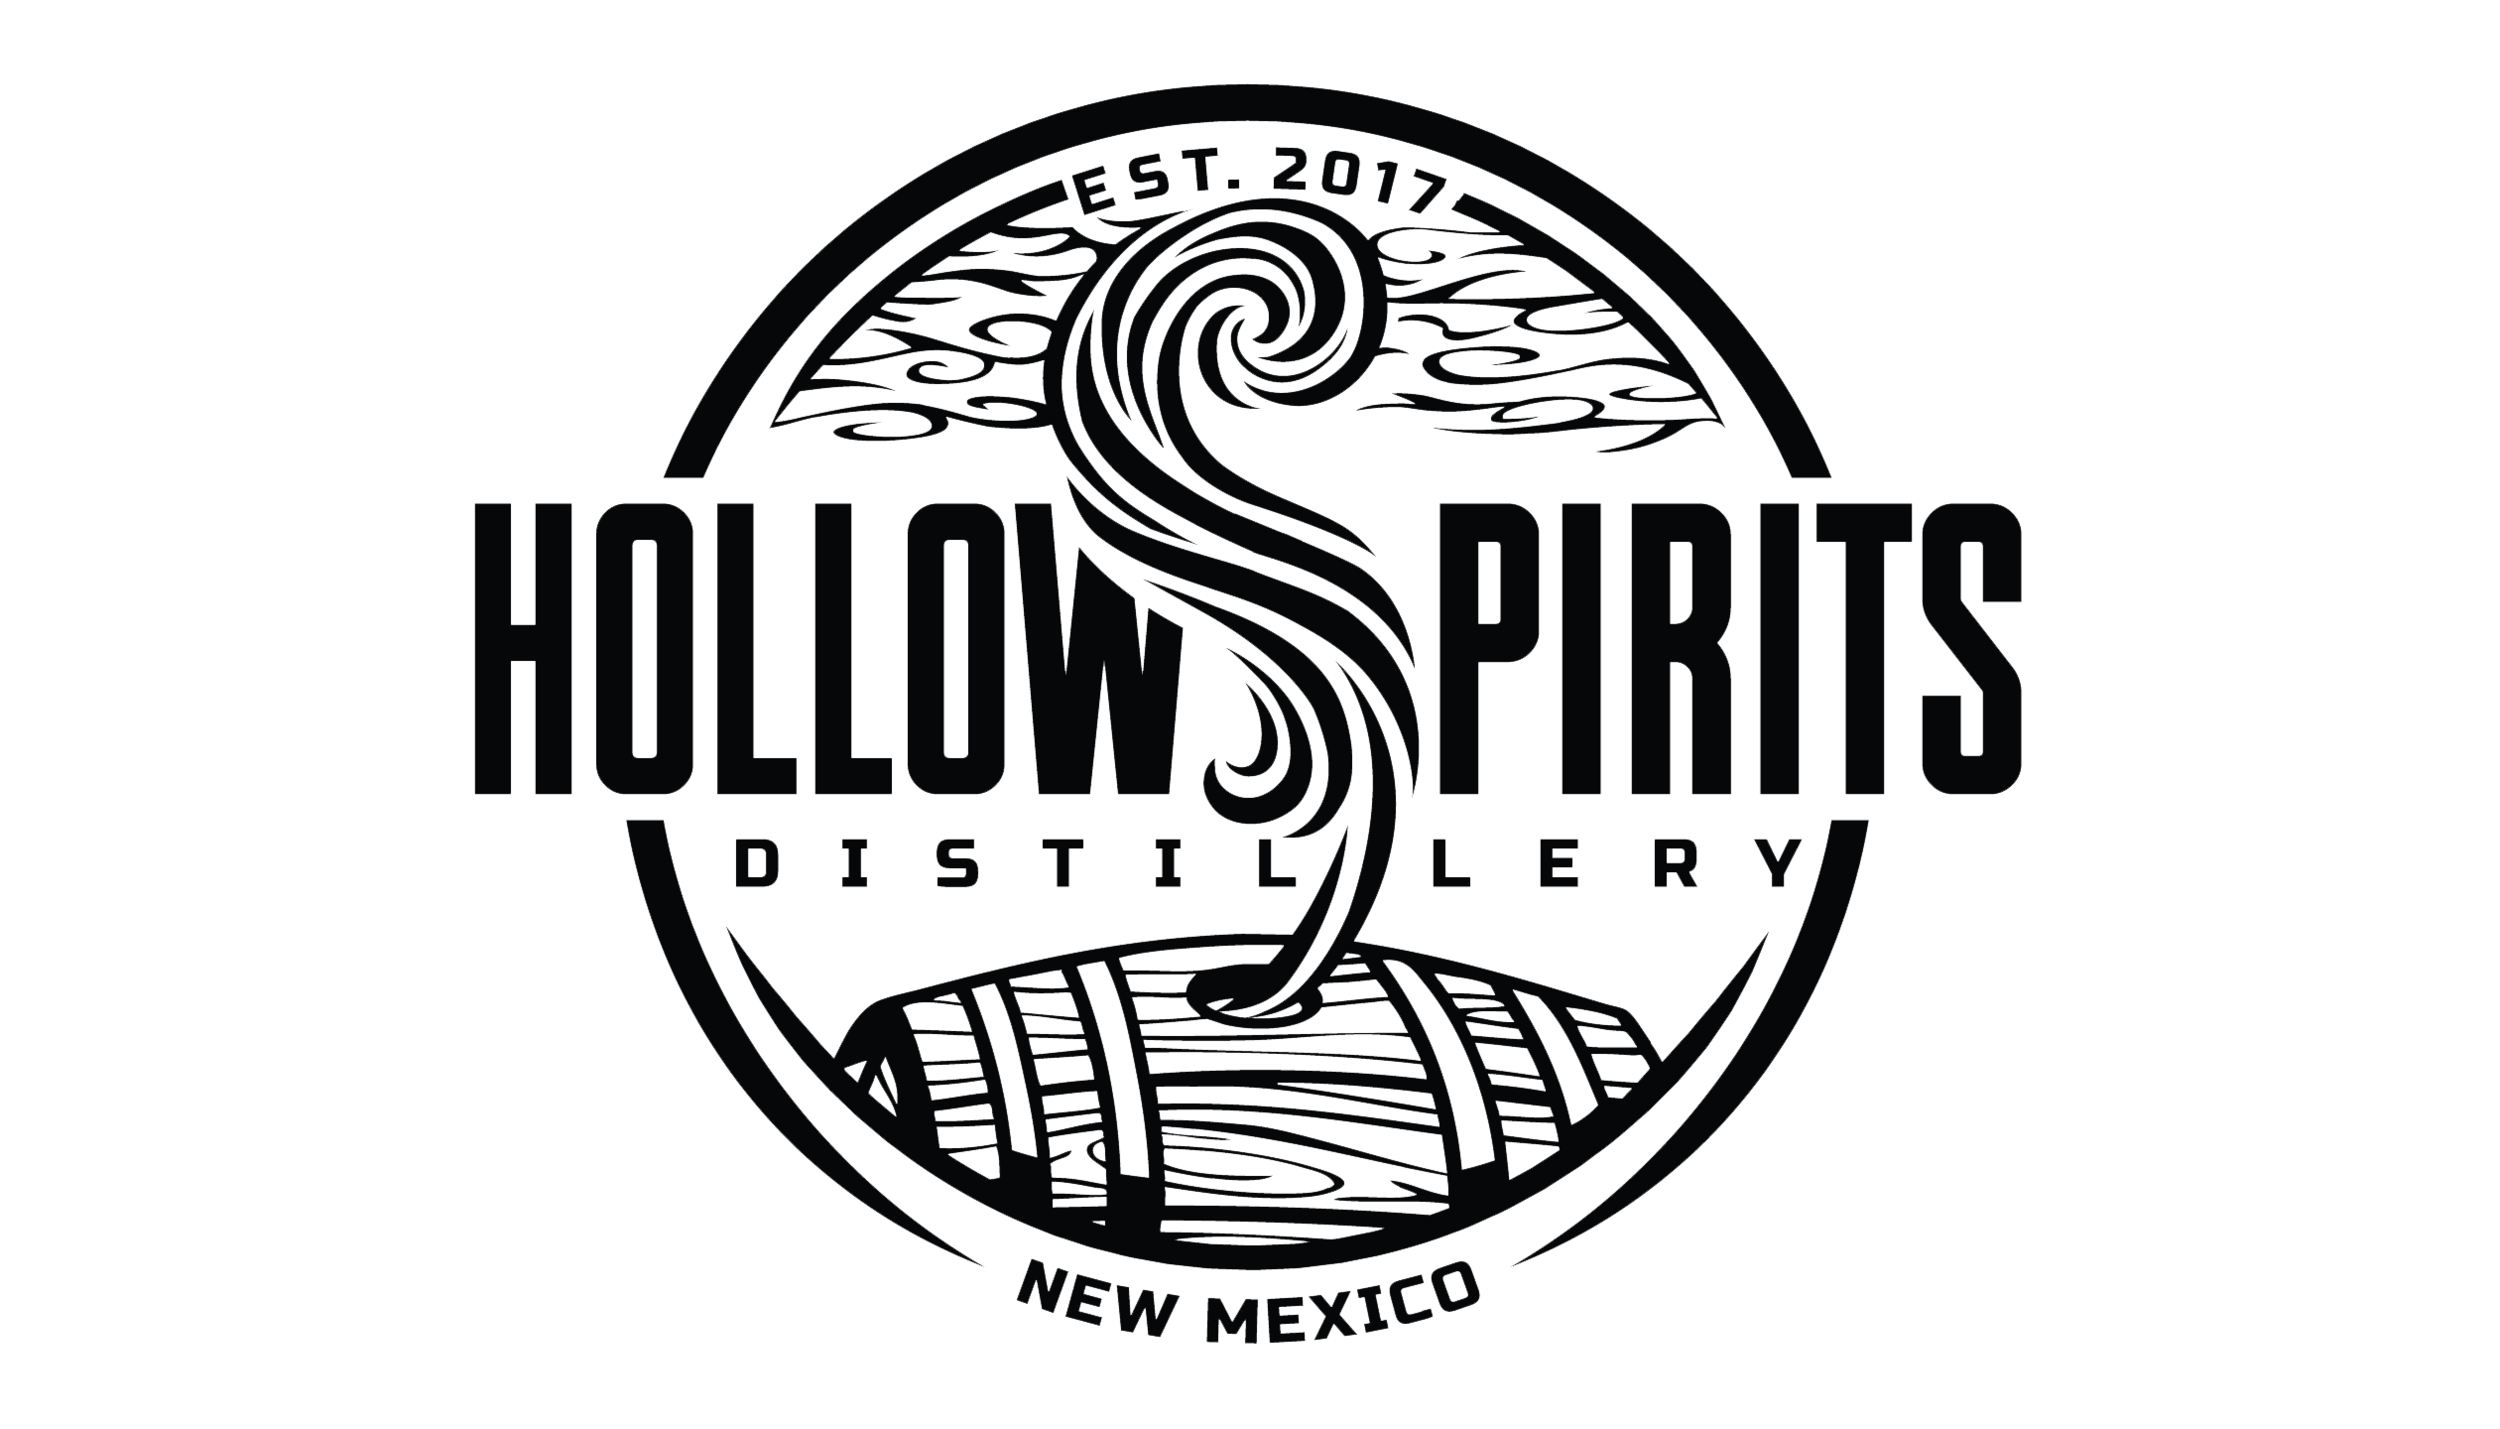 Hollow Spirits Distillery